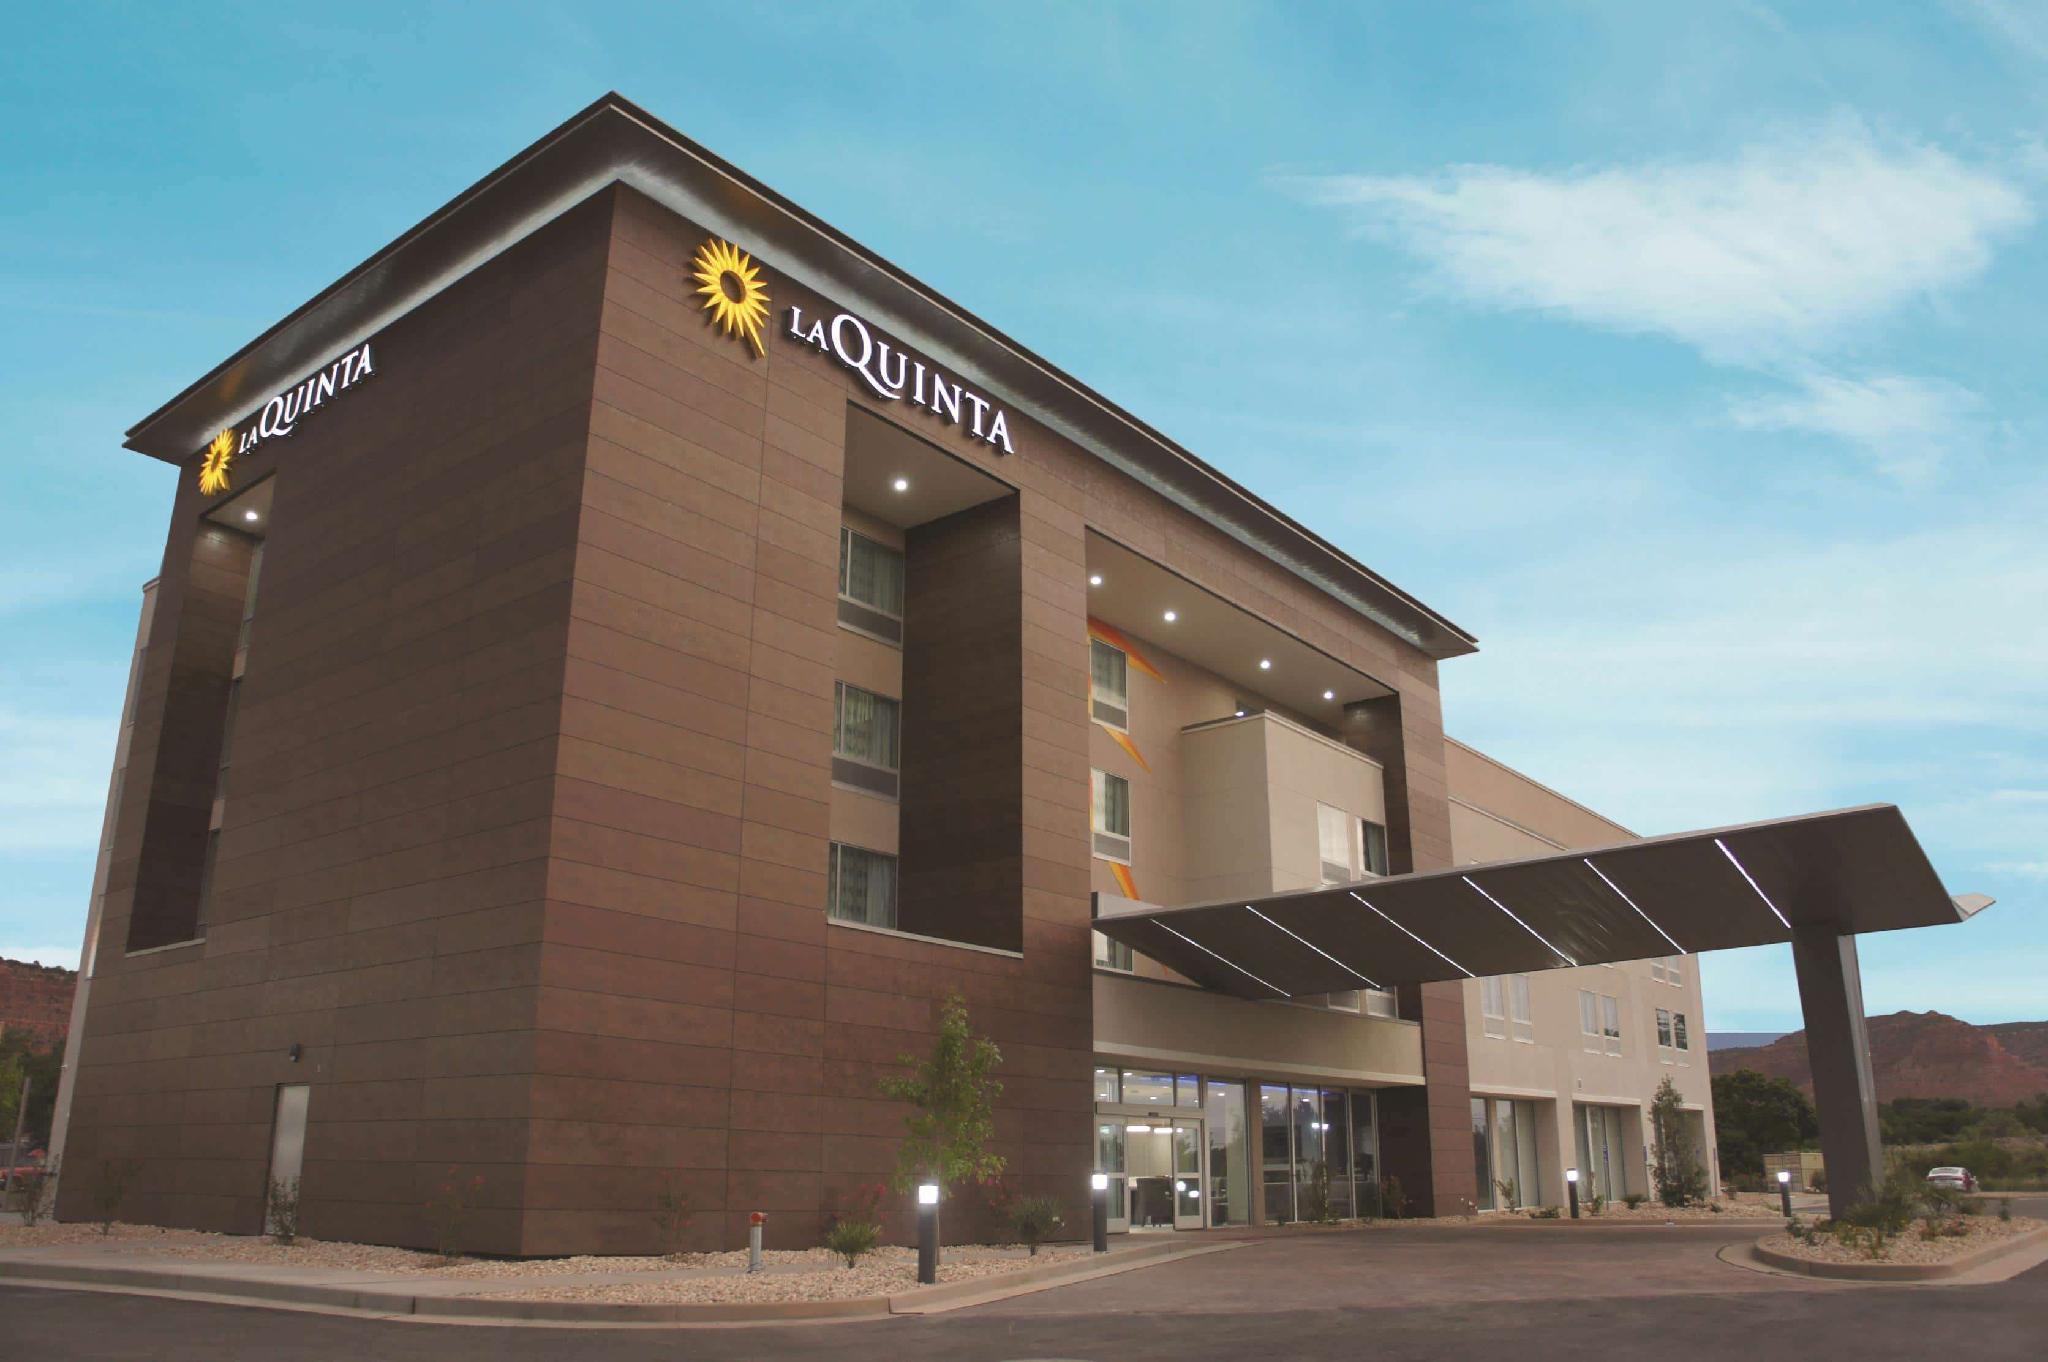 La Quinta Inn And Suites By Wyndham Kanab